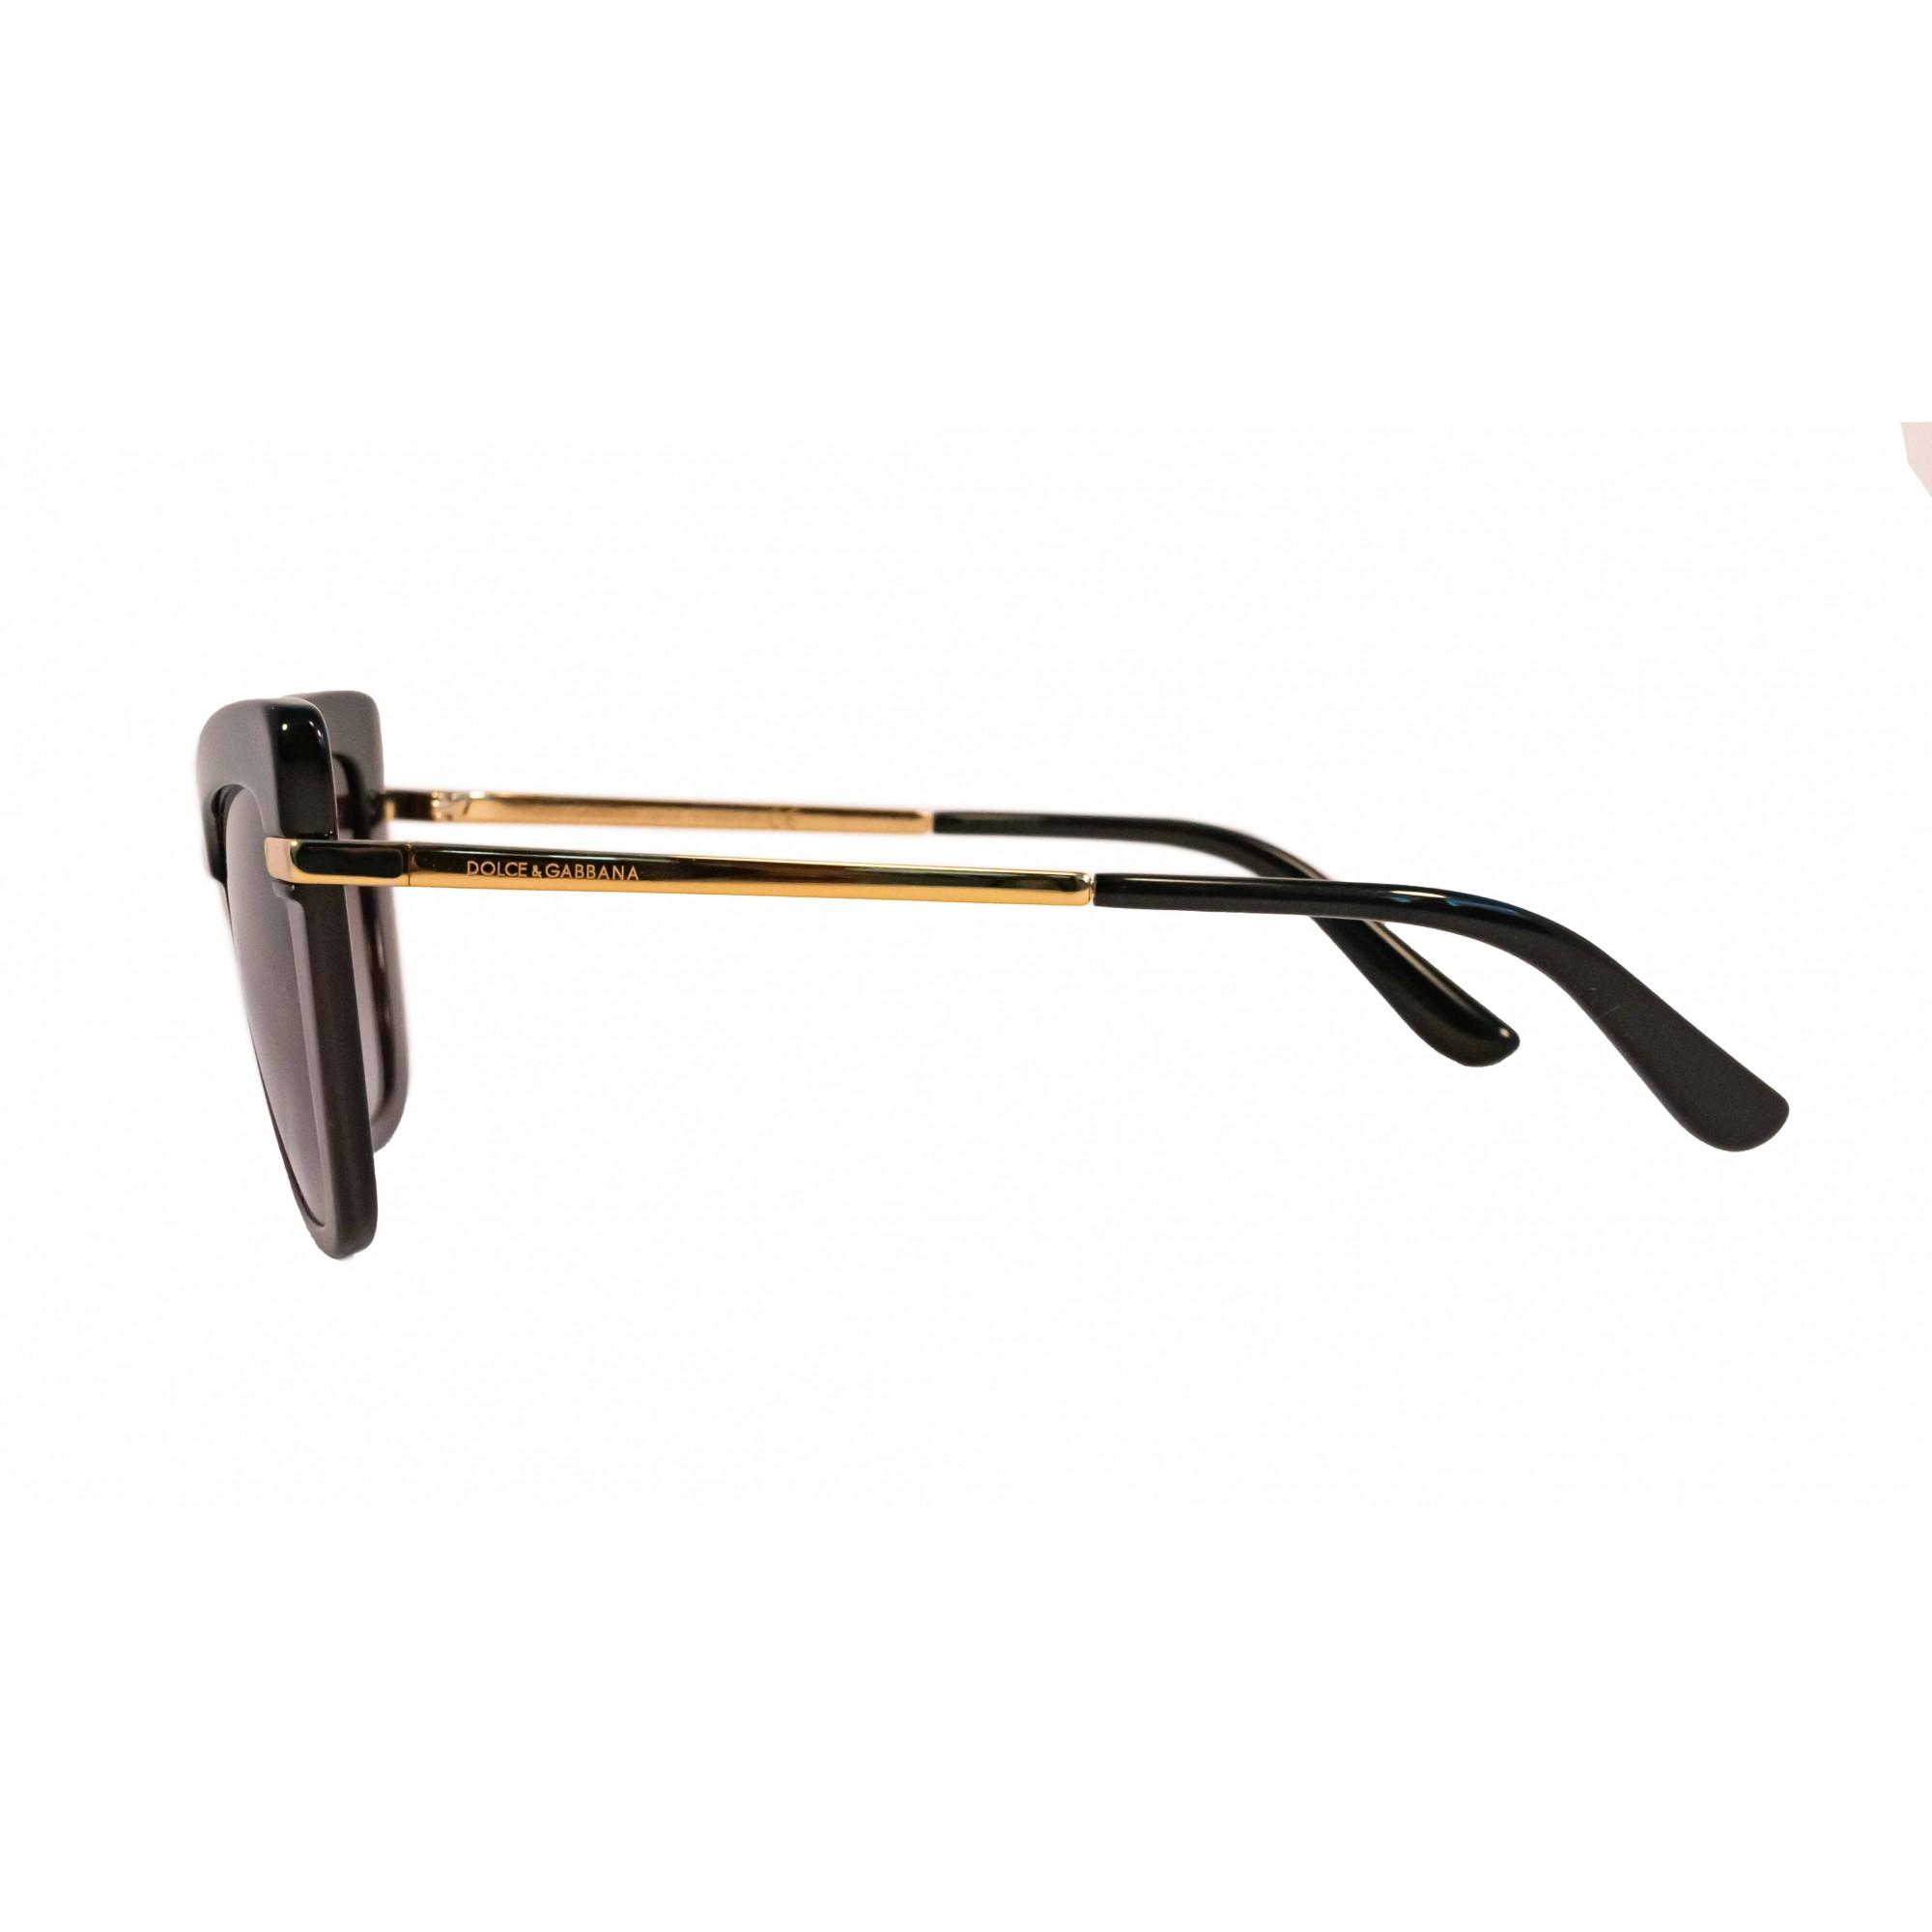 Óculos Dolce&Gabbana Cat Eye Dg4374 32468g 54 Preto